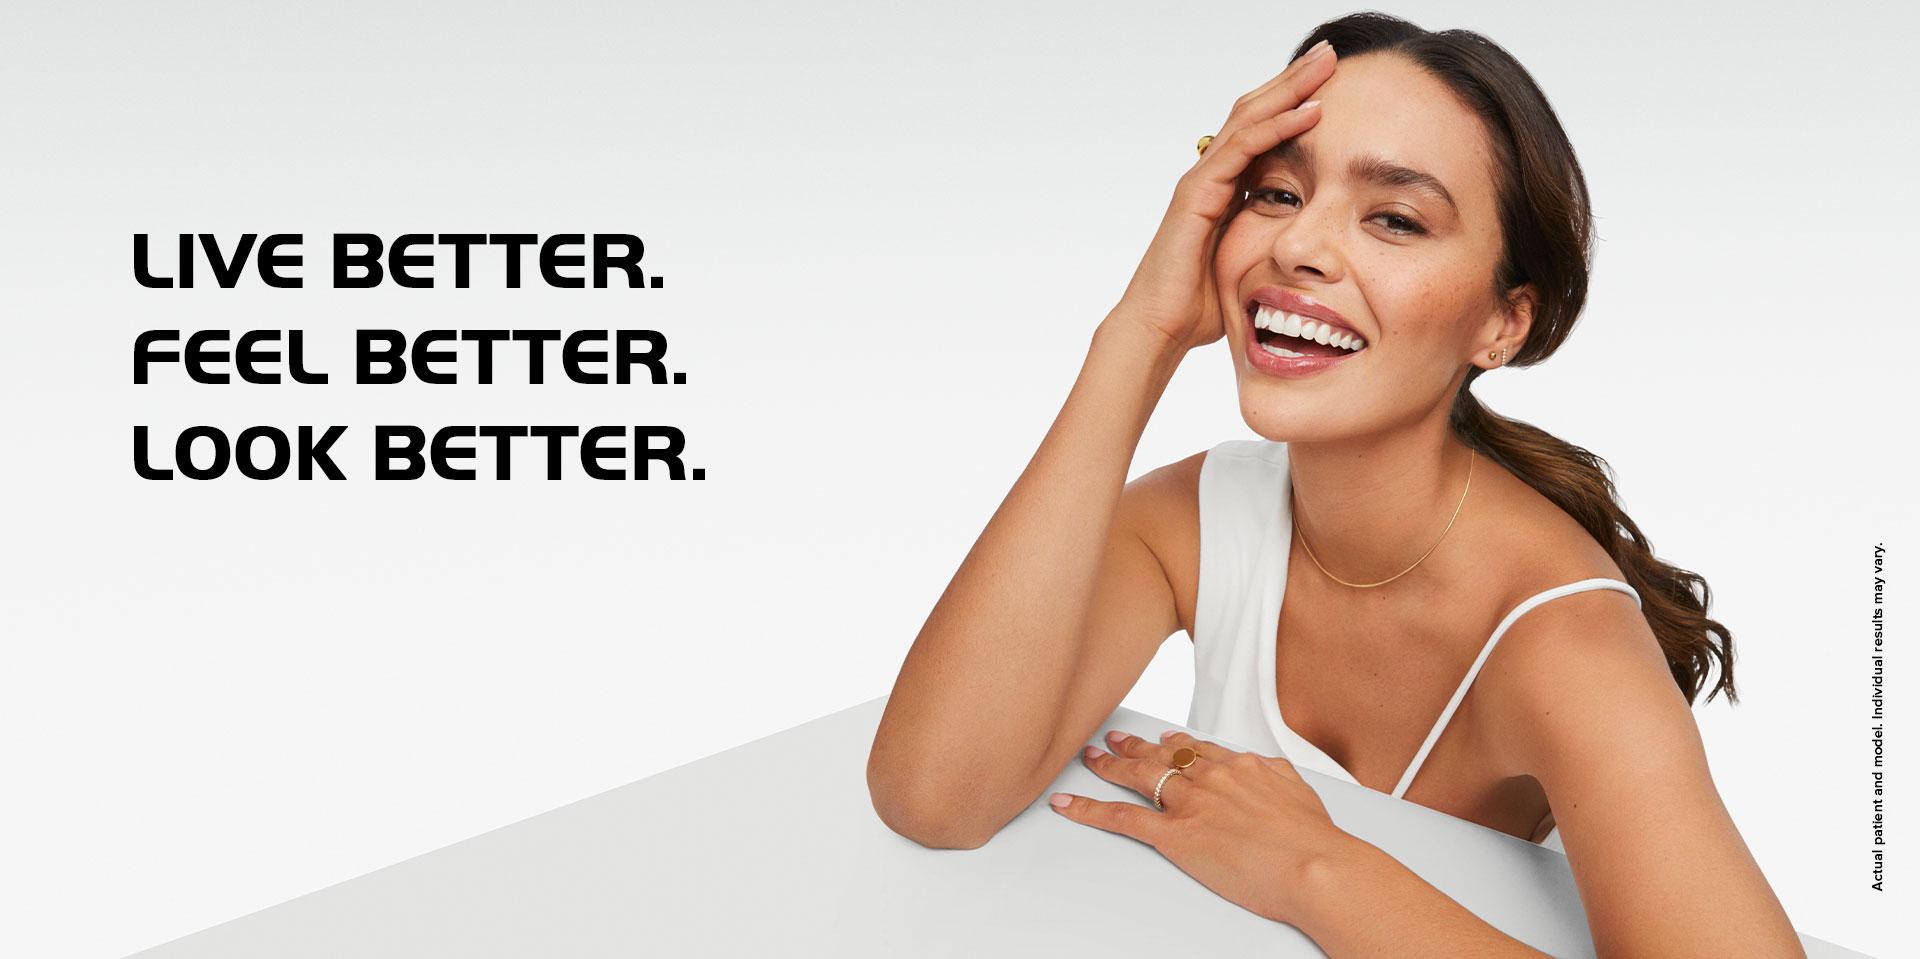 Gwyneth Paltrow Goes Pure. Will you?